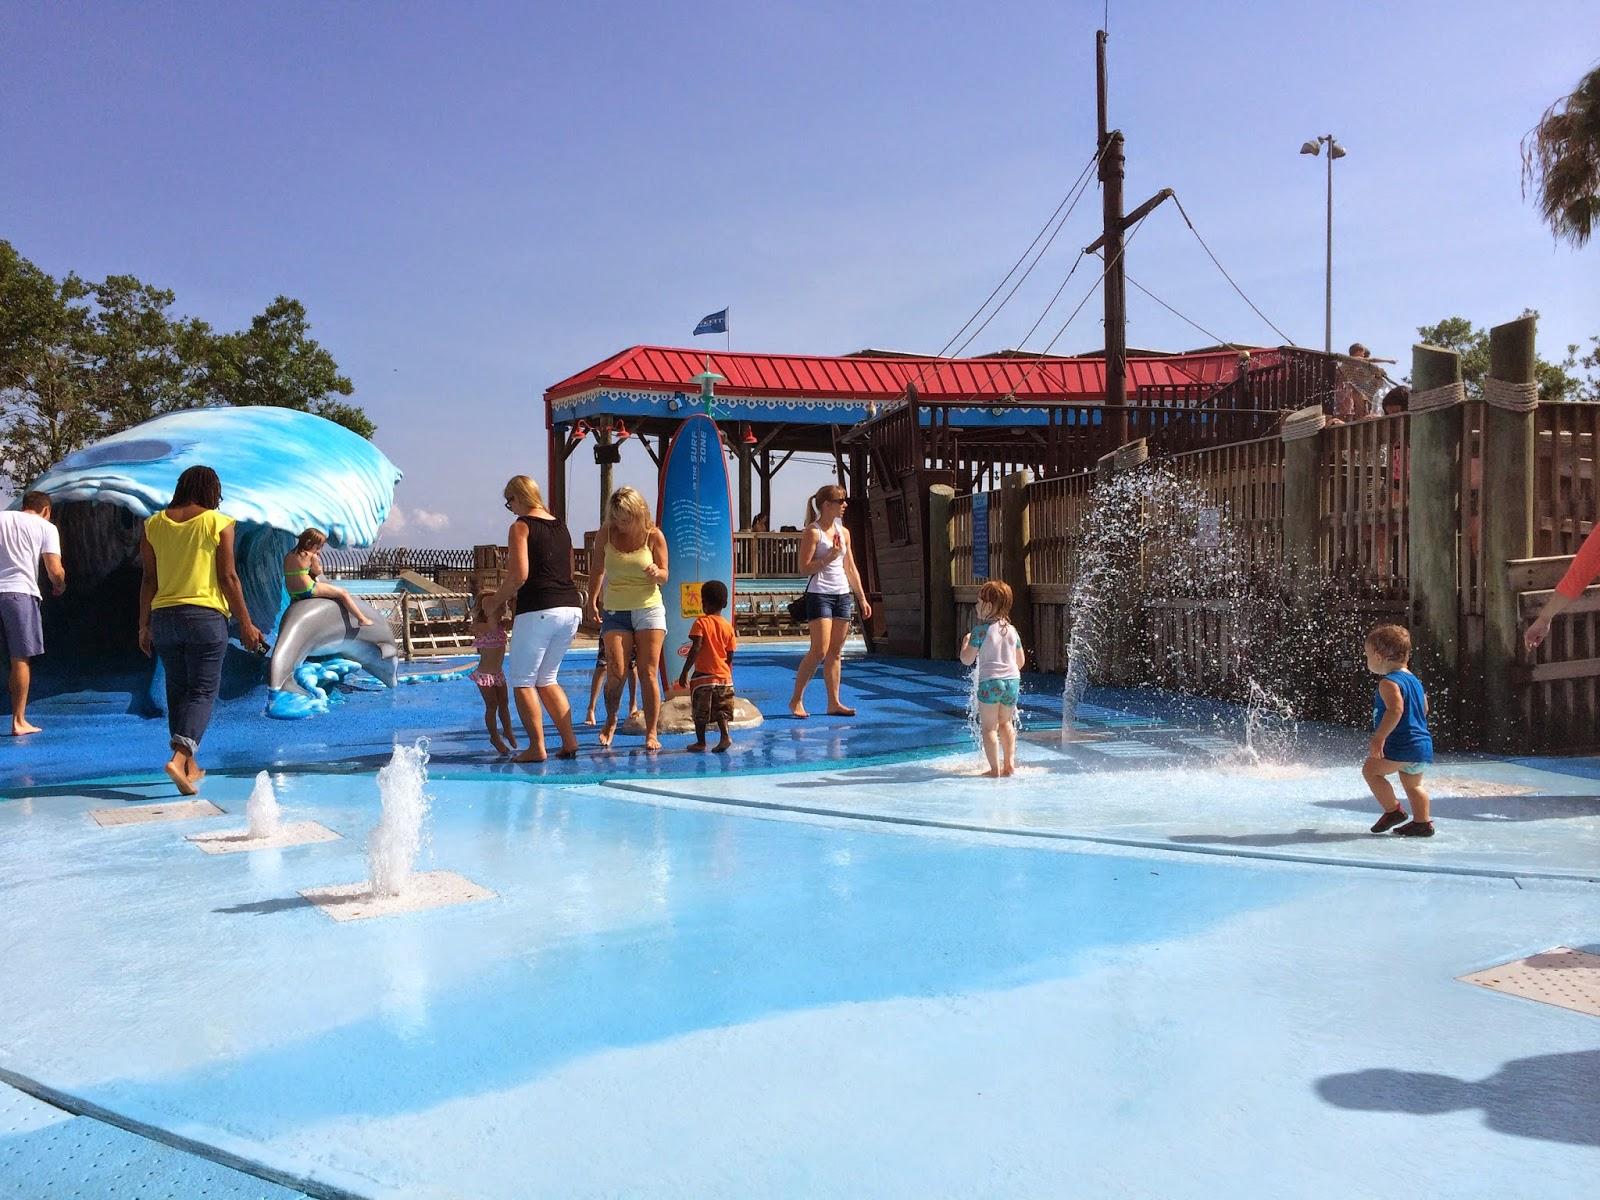 #ivysvariety The Florida Aquarium splash pad